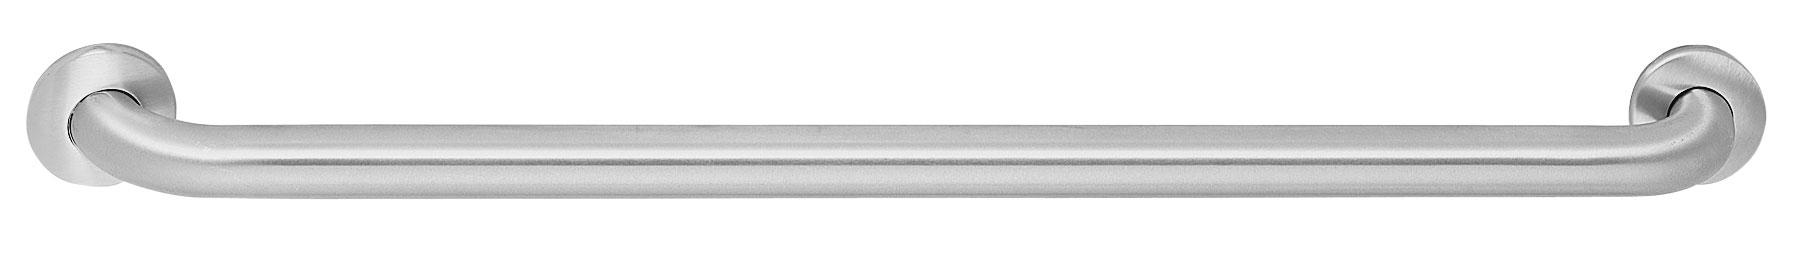 "Bradley 8122-001300 Peened Safety Grip Grab Bar 1-1/2"" OD x 30"""